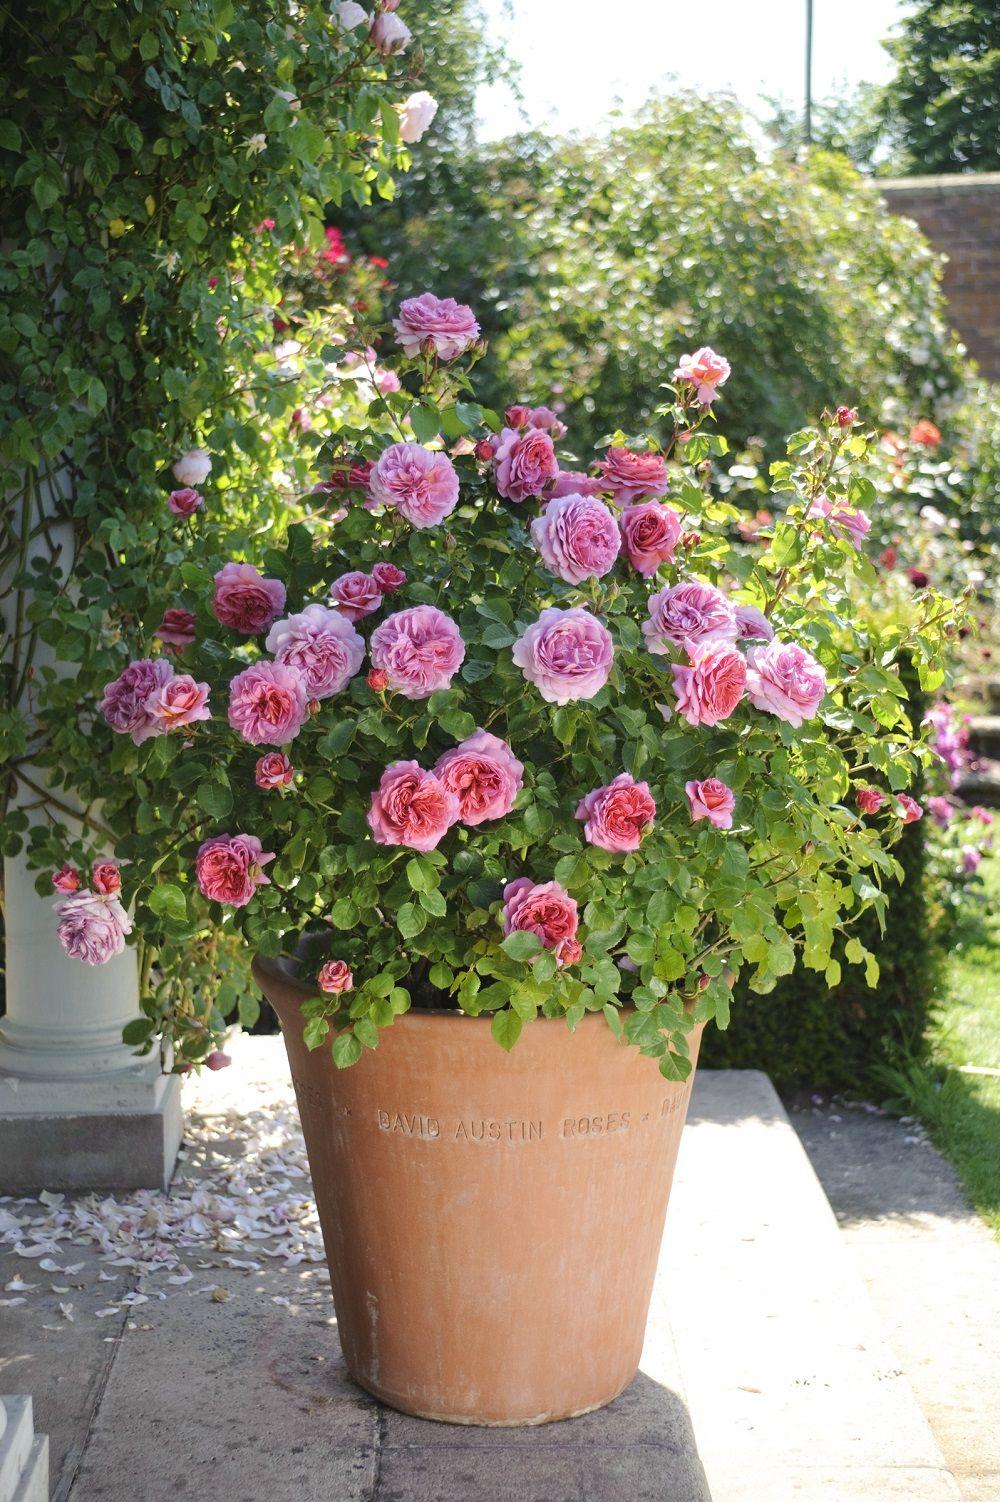 Rosa Rampicante In Vaso princess alexandra of kent in terracotta pot #davidaustin